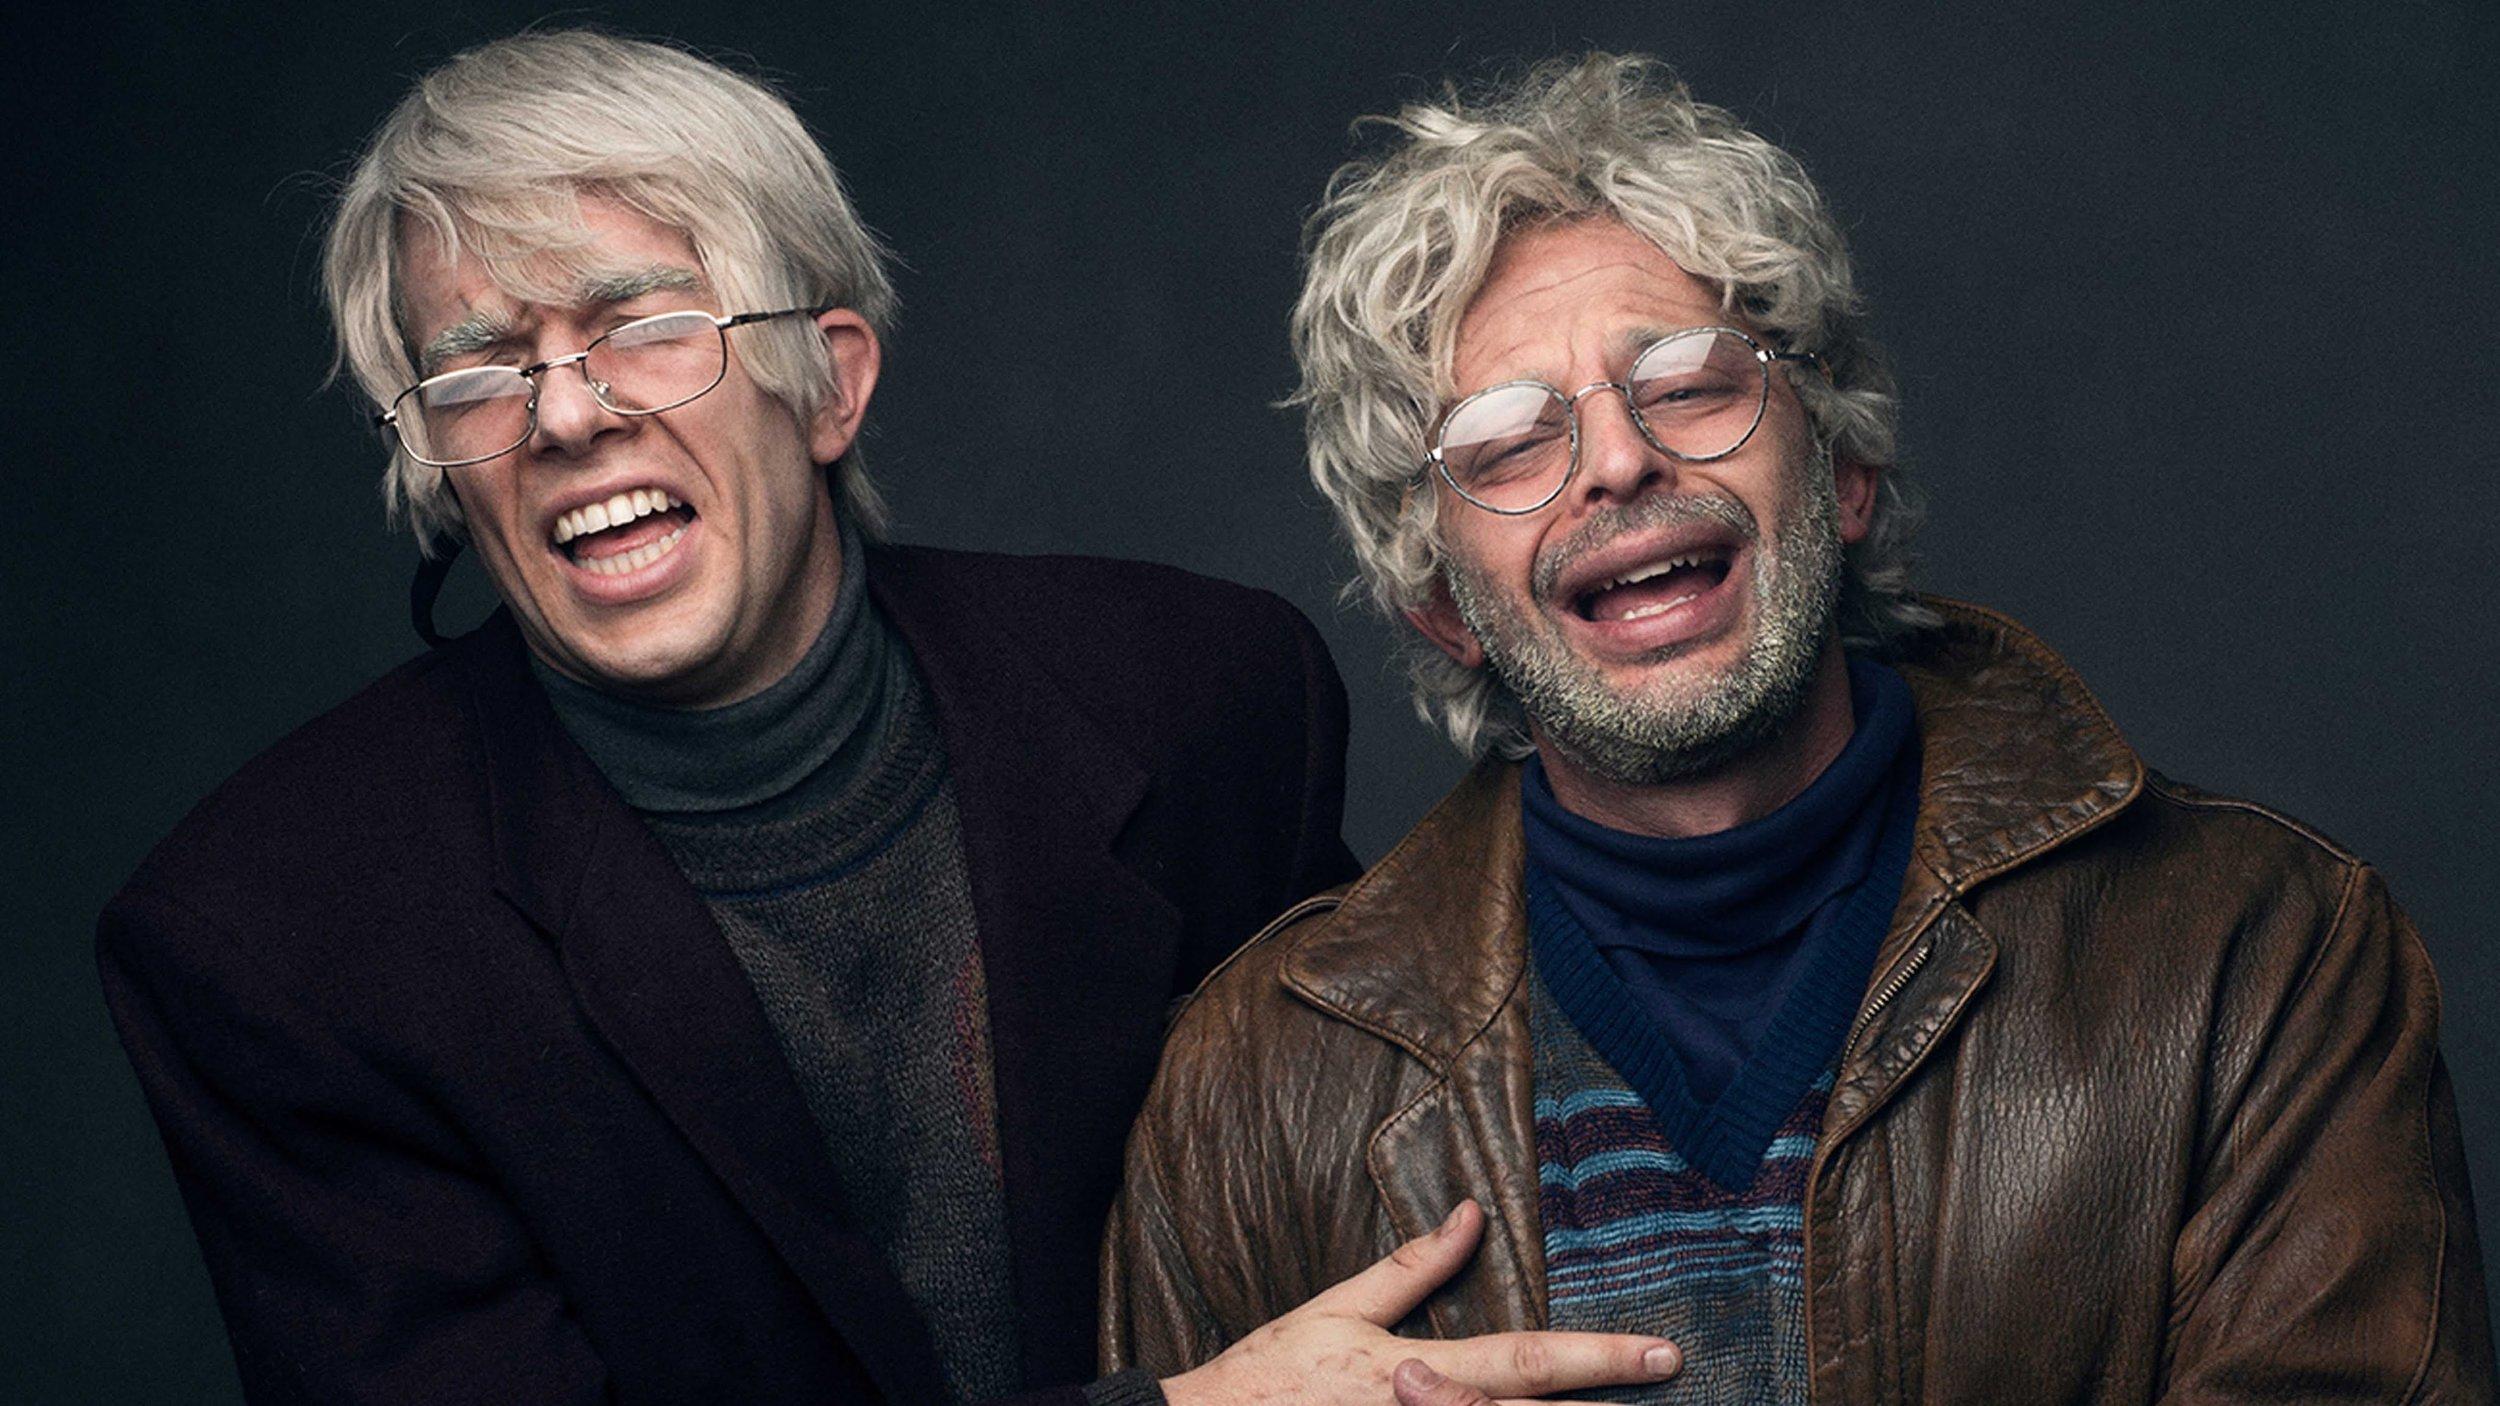 John Mulaney (left) and Nick Kroll (right)